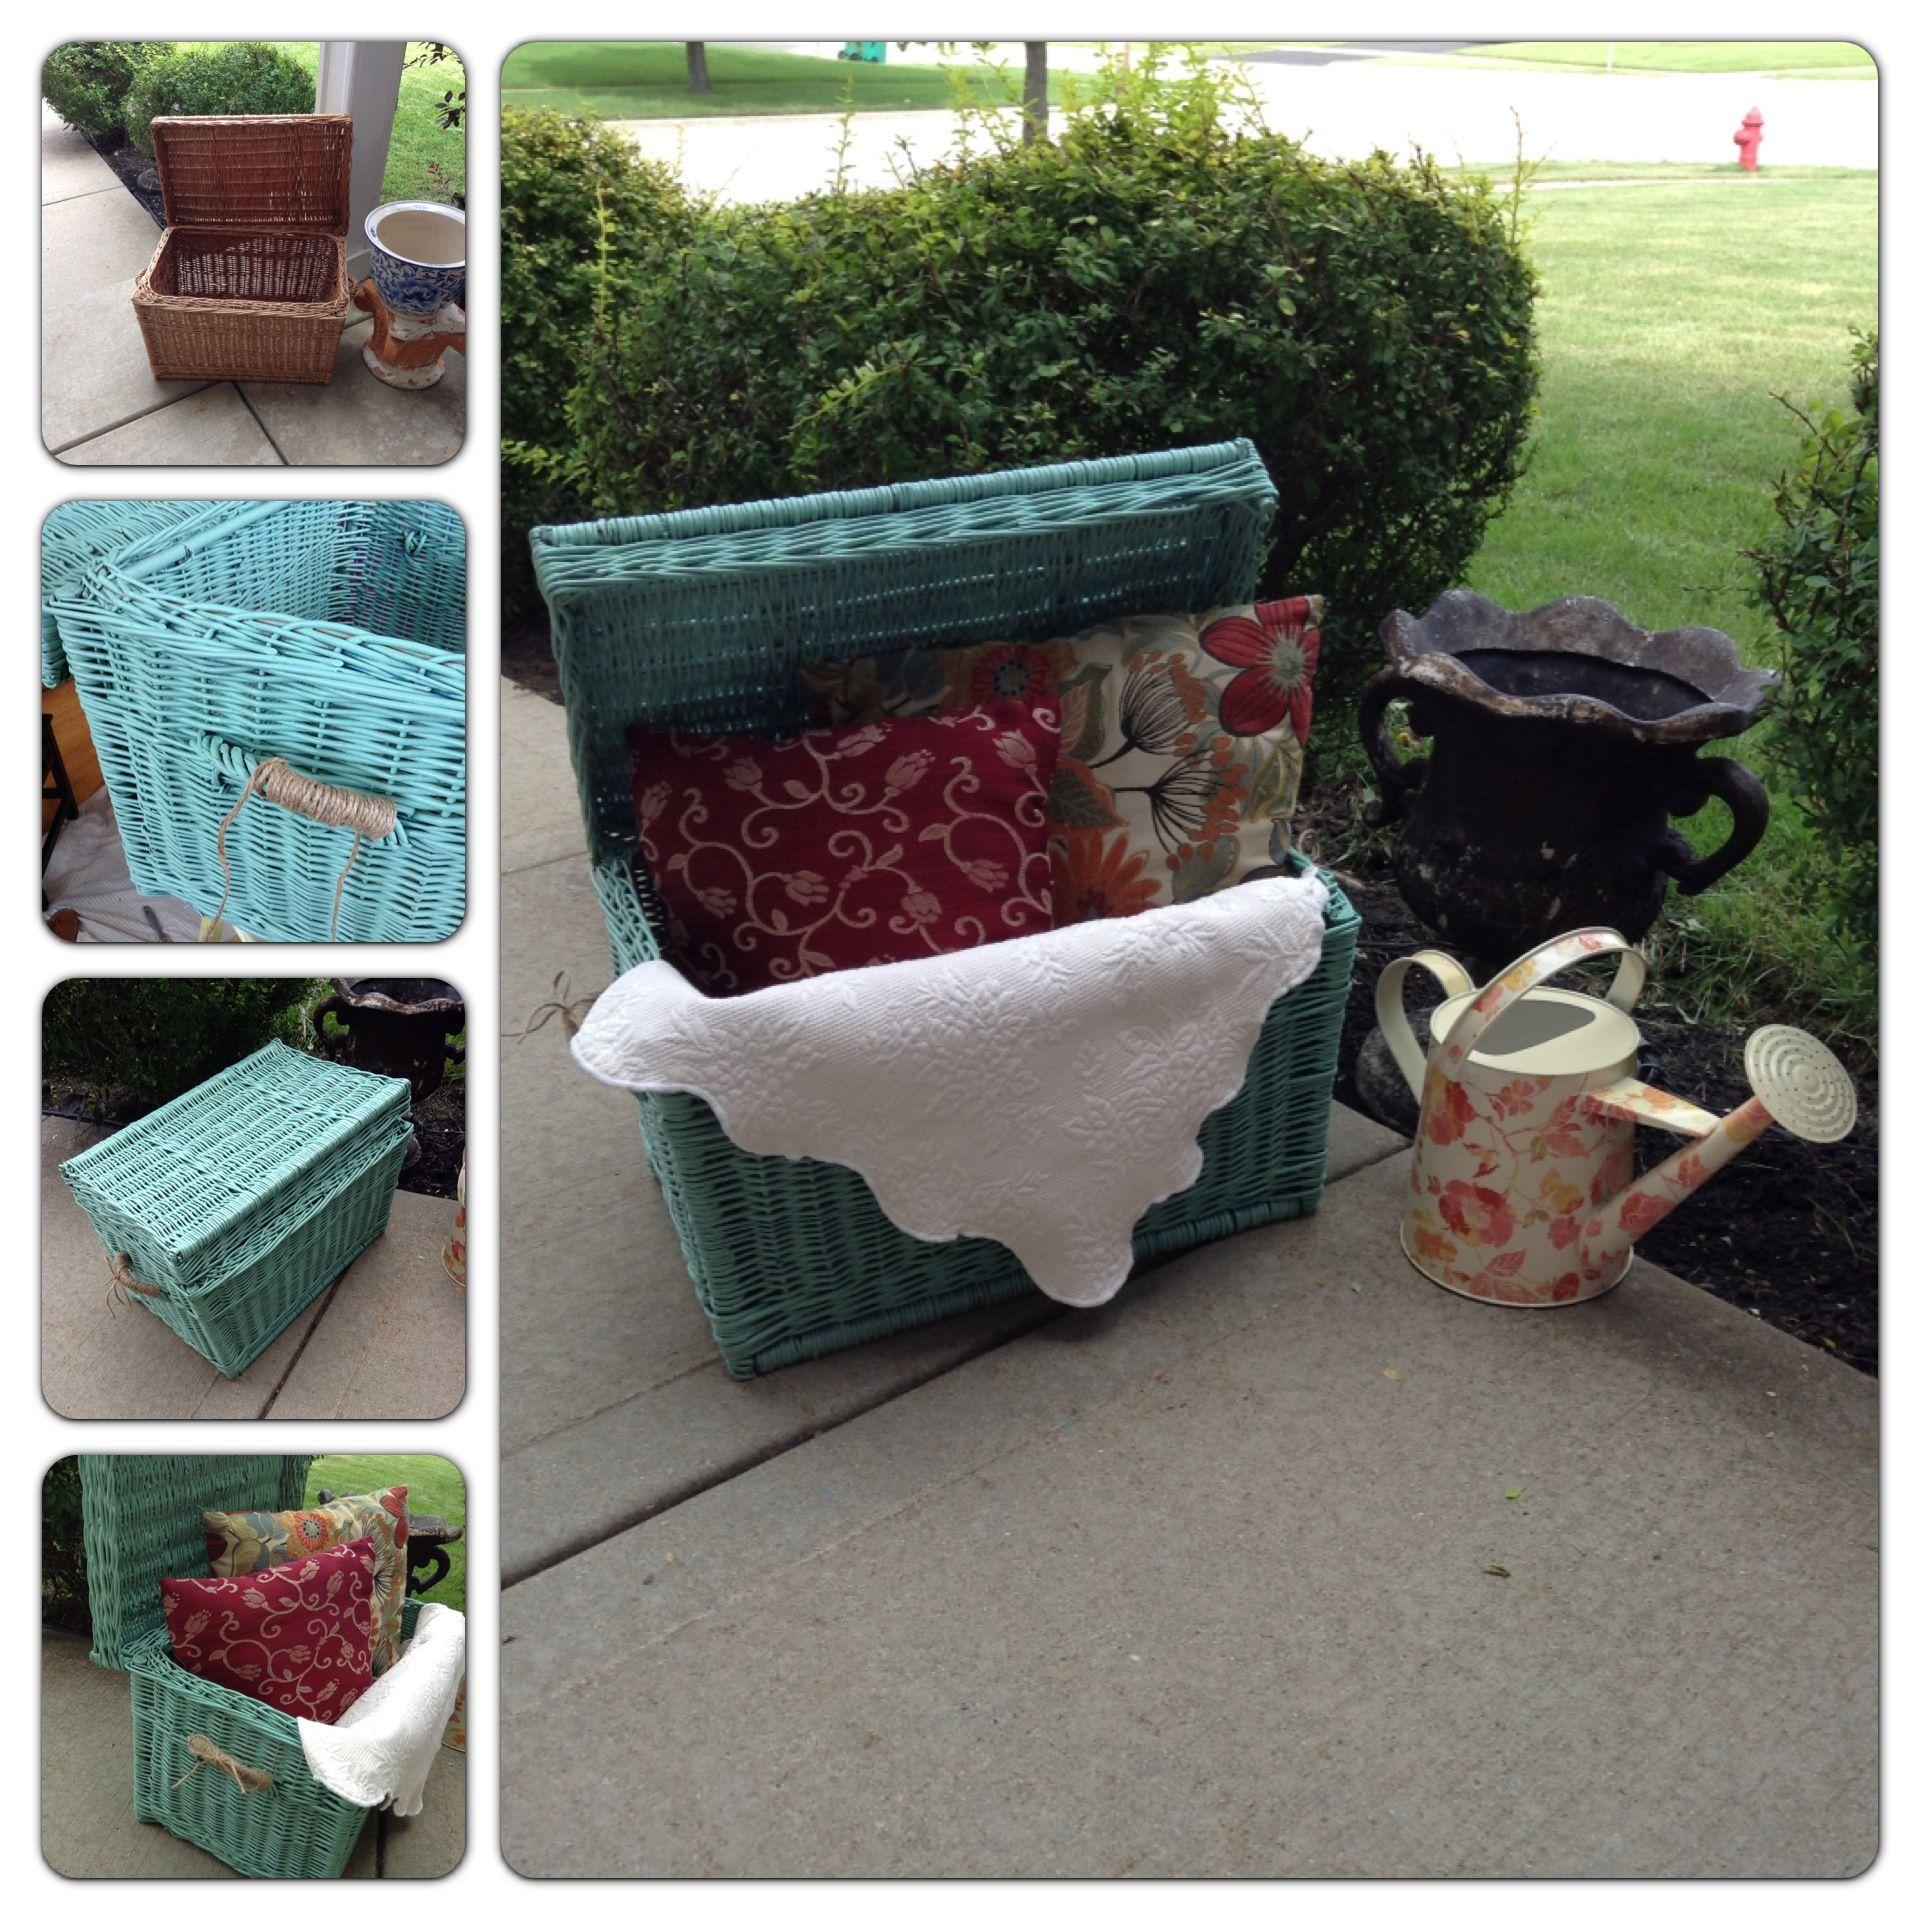 La Canasta ~ old basket, old blankets & pillows nice porch or bedroom decor.